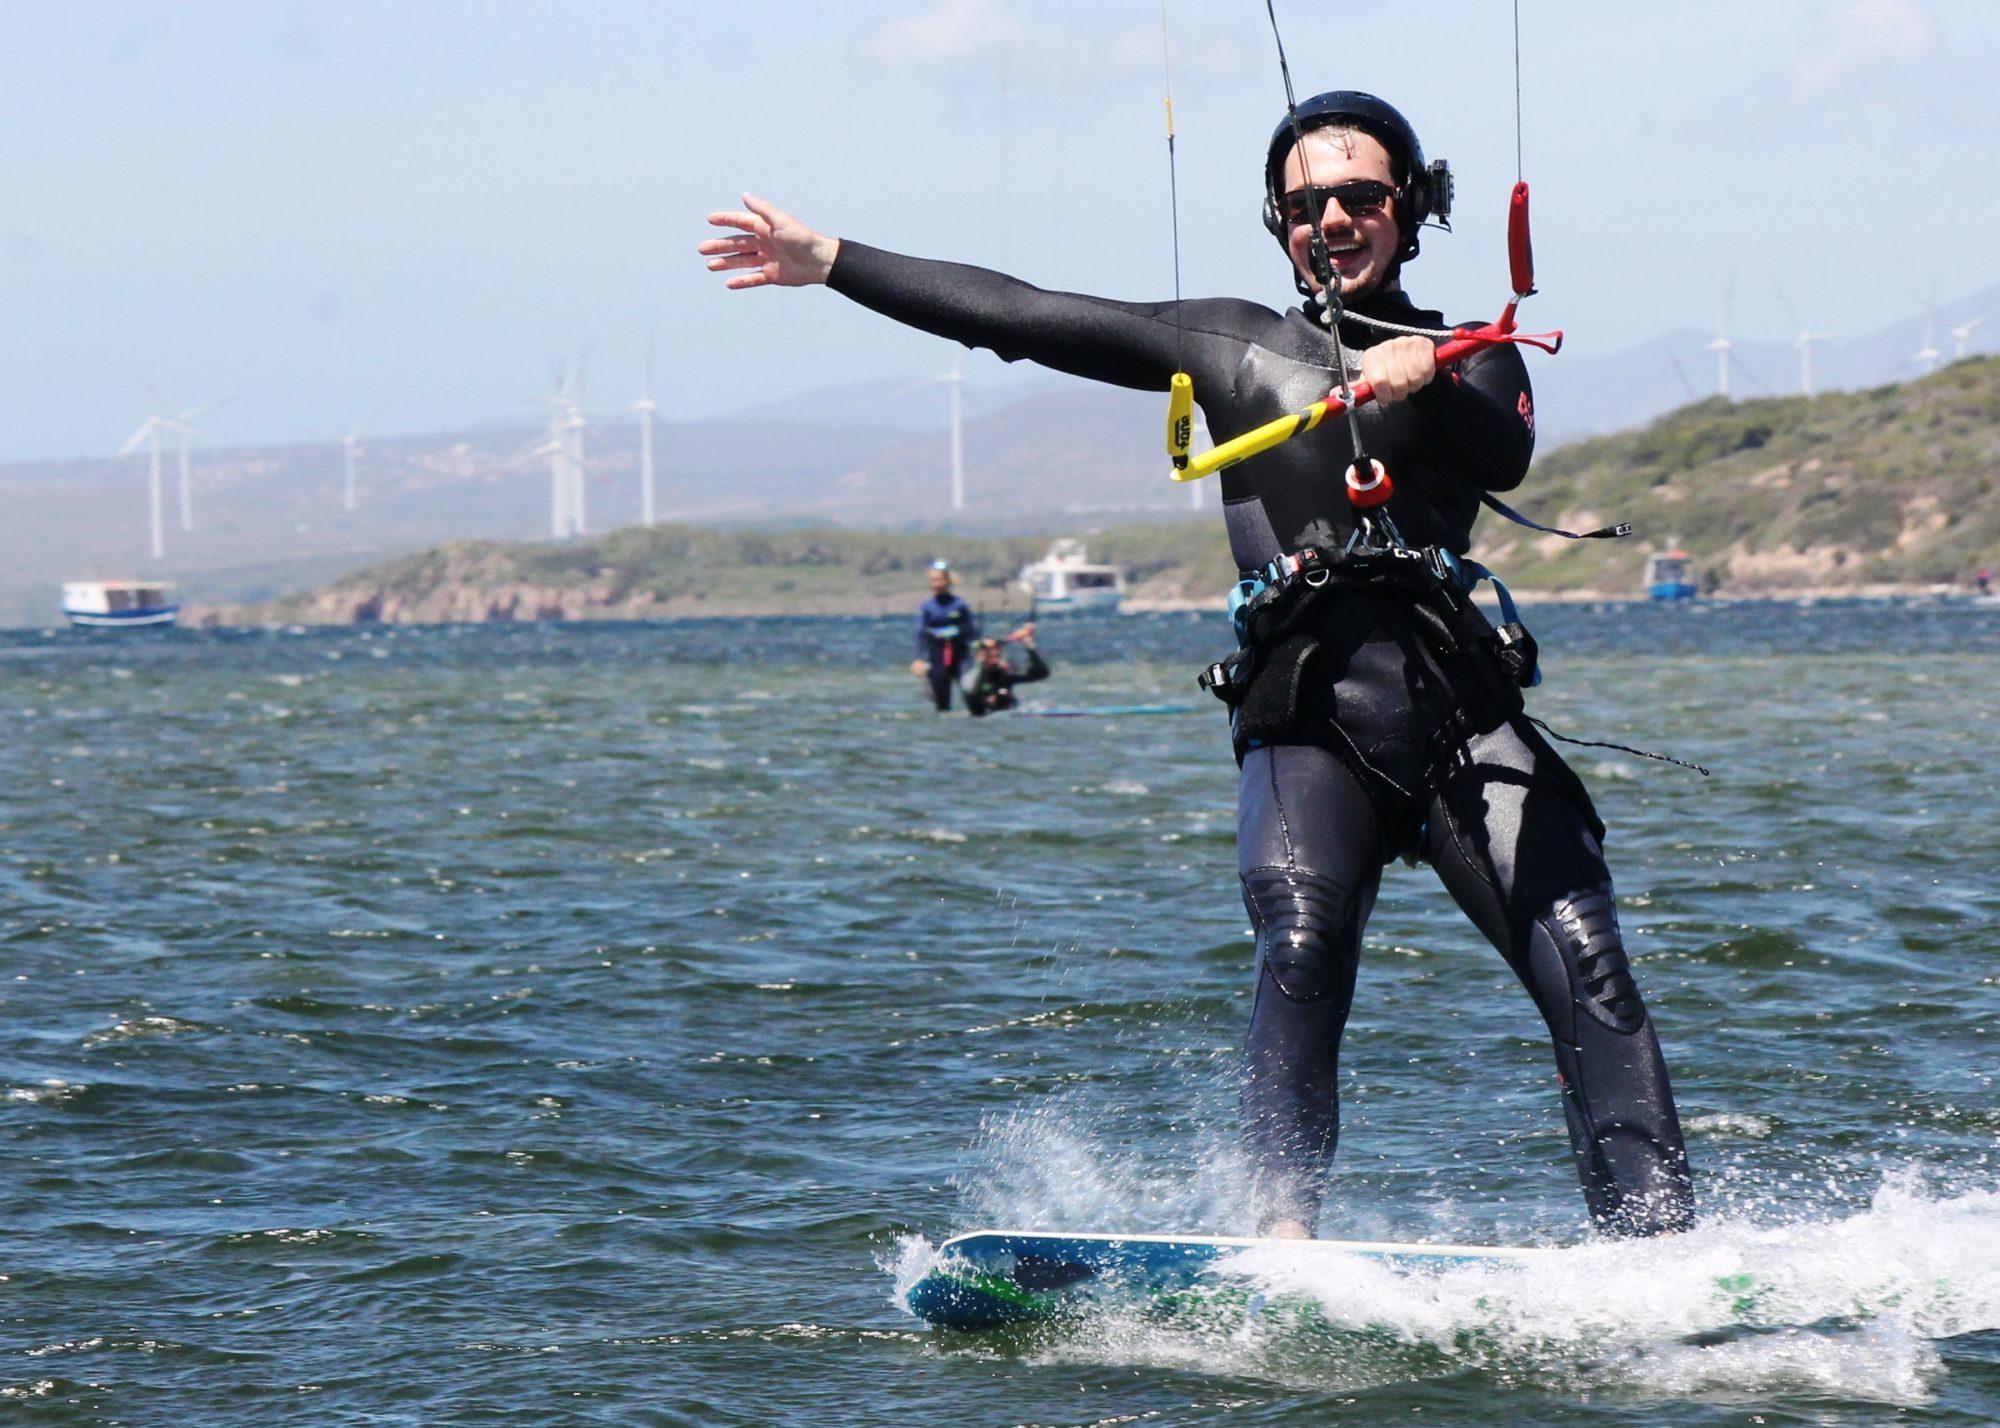 Kitesurfing Lessons in Punta Trettu Sardinia